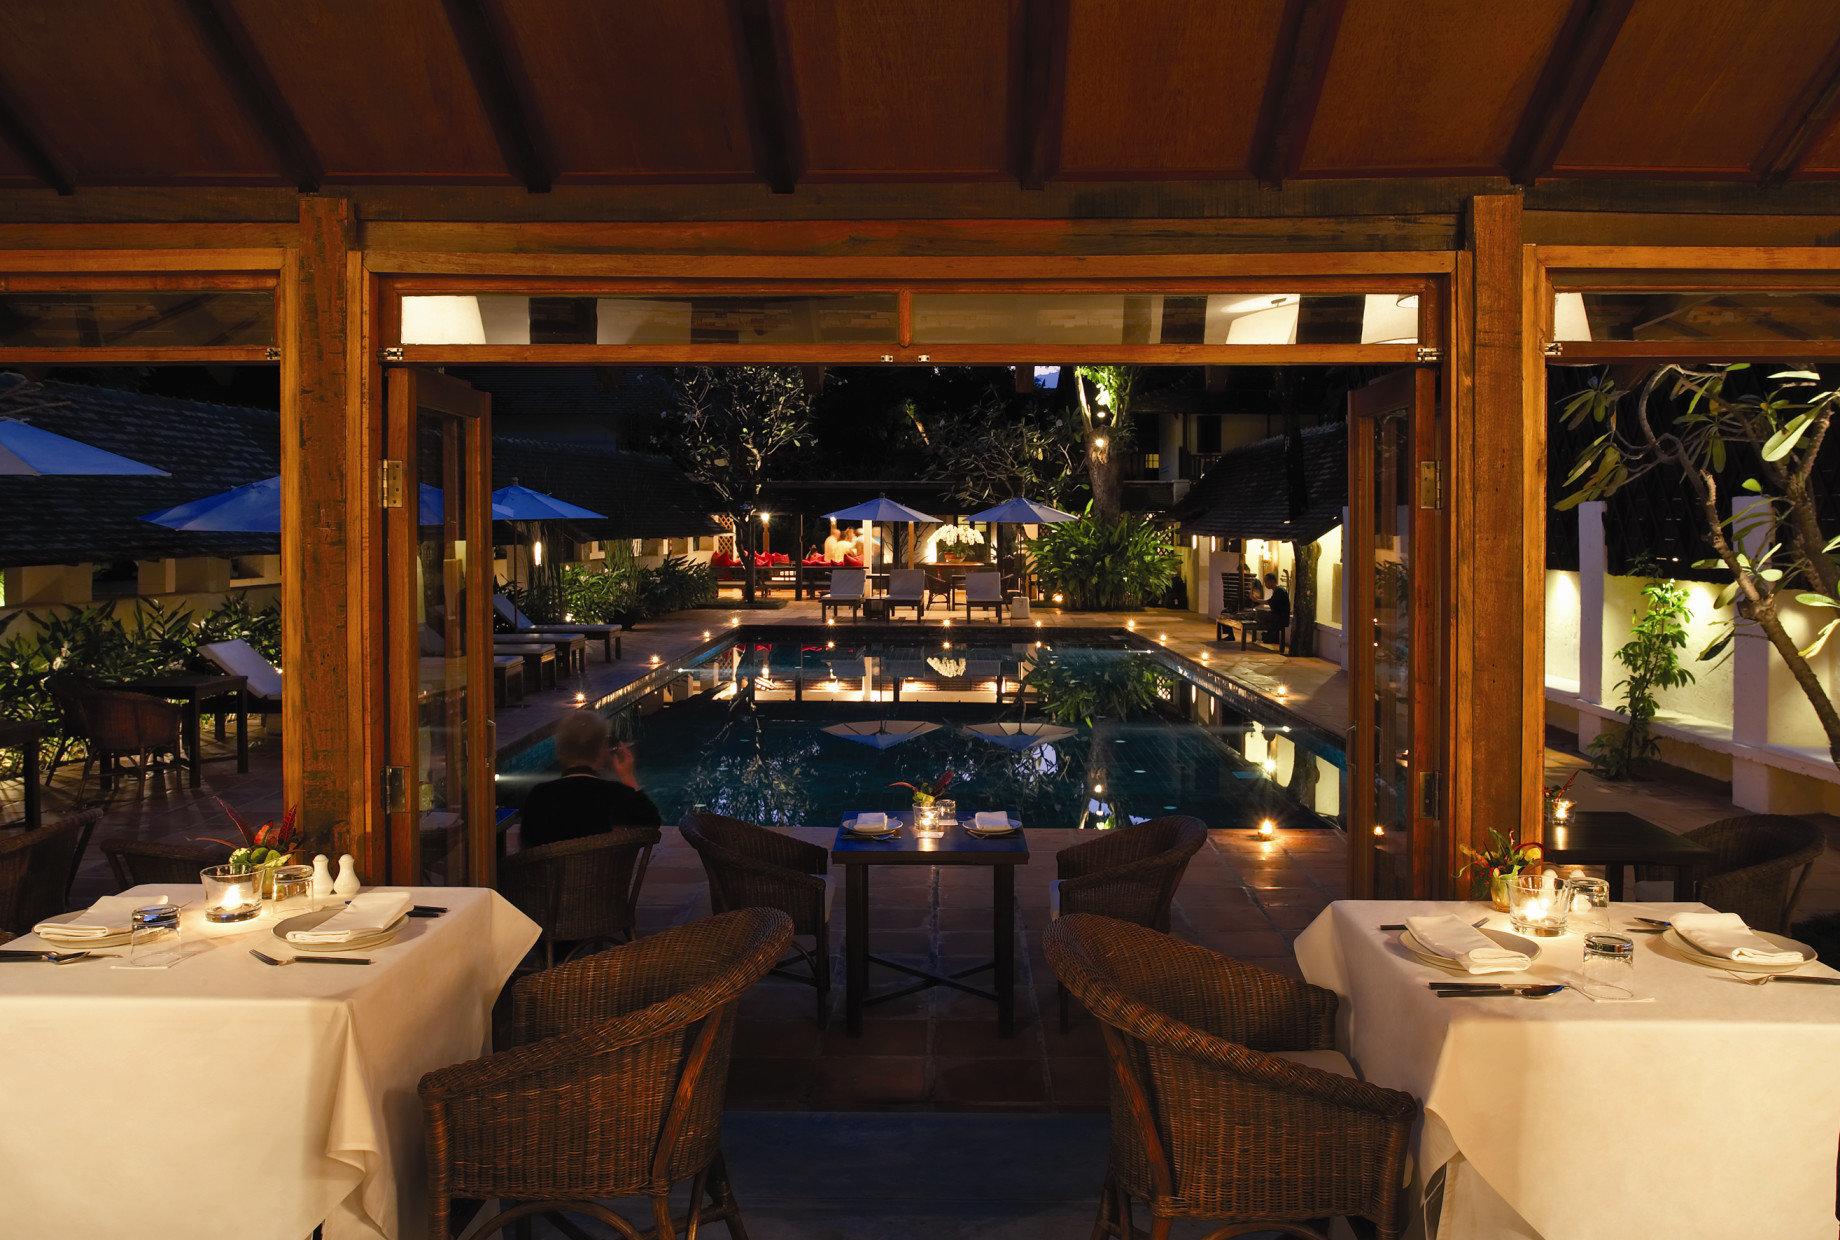 Dining Drink Eat Pool Scenic views restaurant Resort function hall Bar